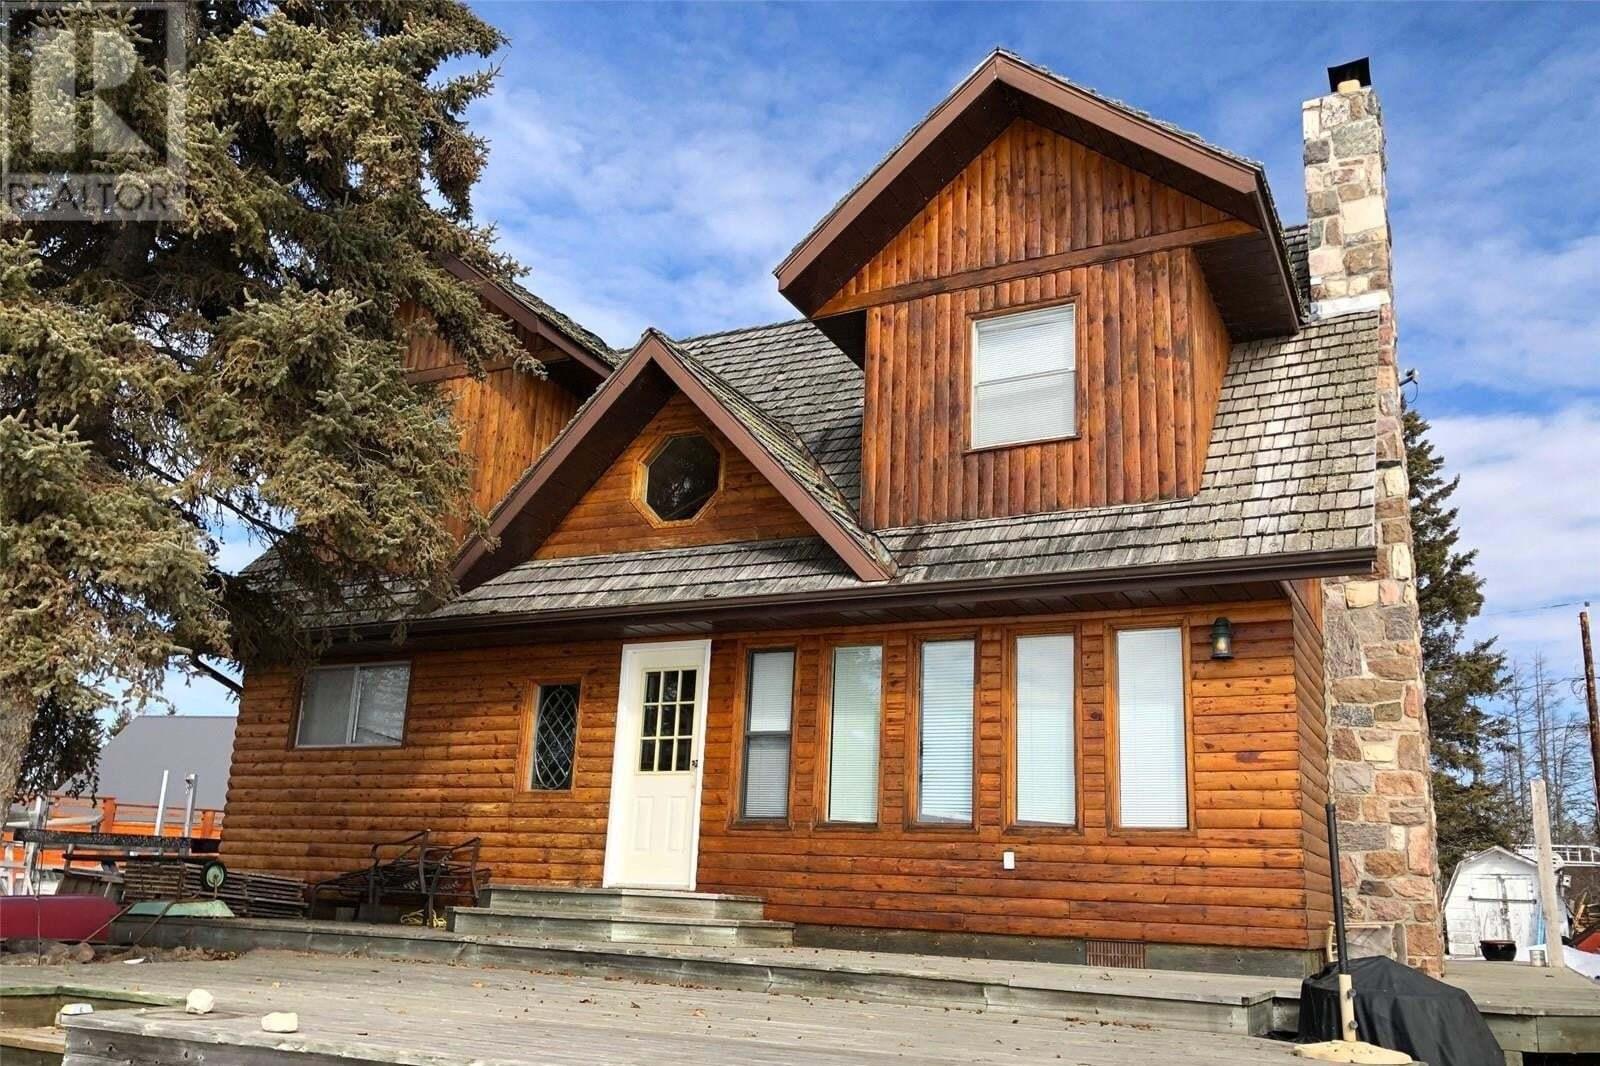 House for sale at 9 Sandy Beach Dr., Lobe's Beach Unit LOT Turtle Lake Saskatchewan - MLS: SK809864